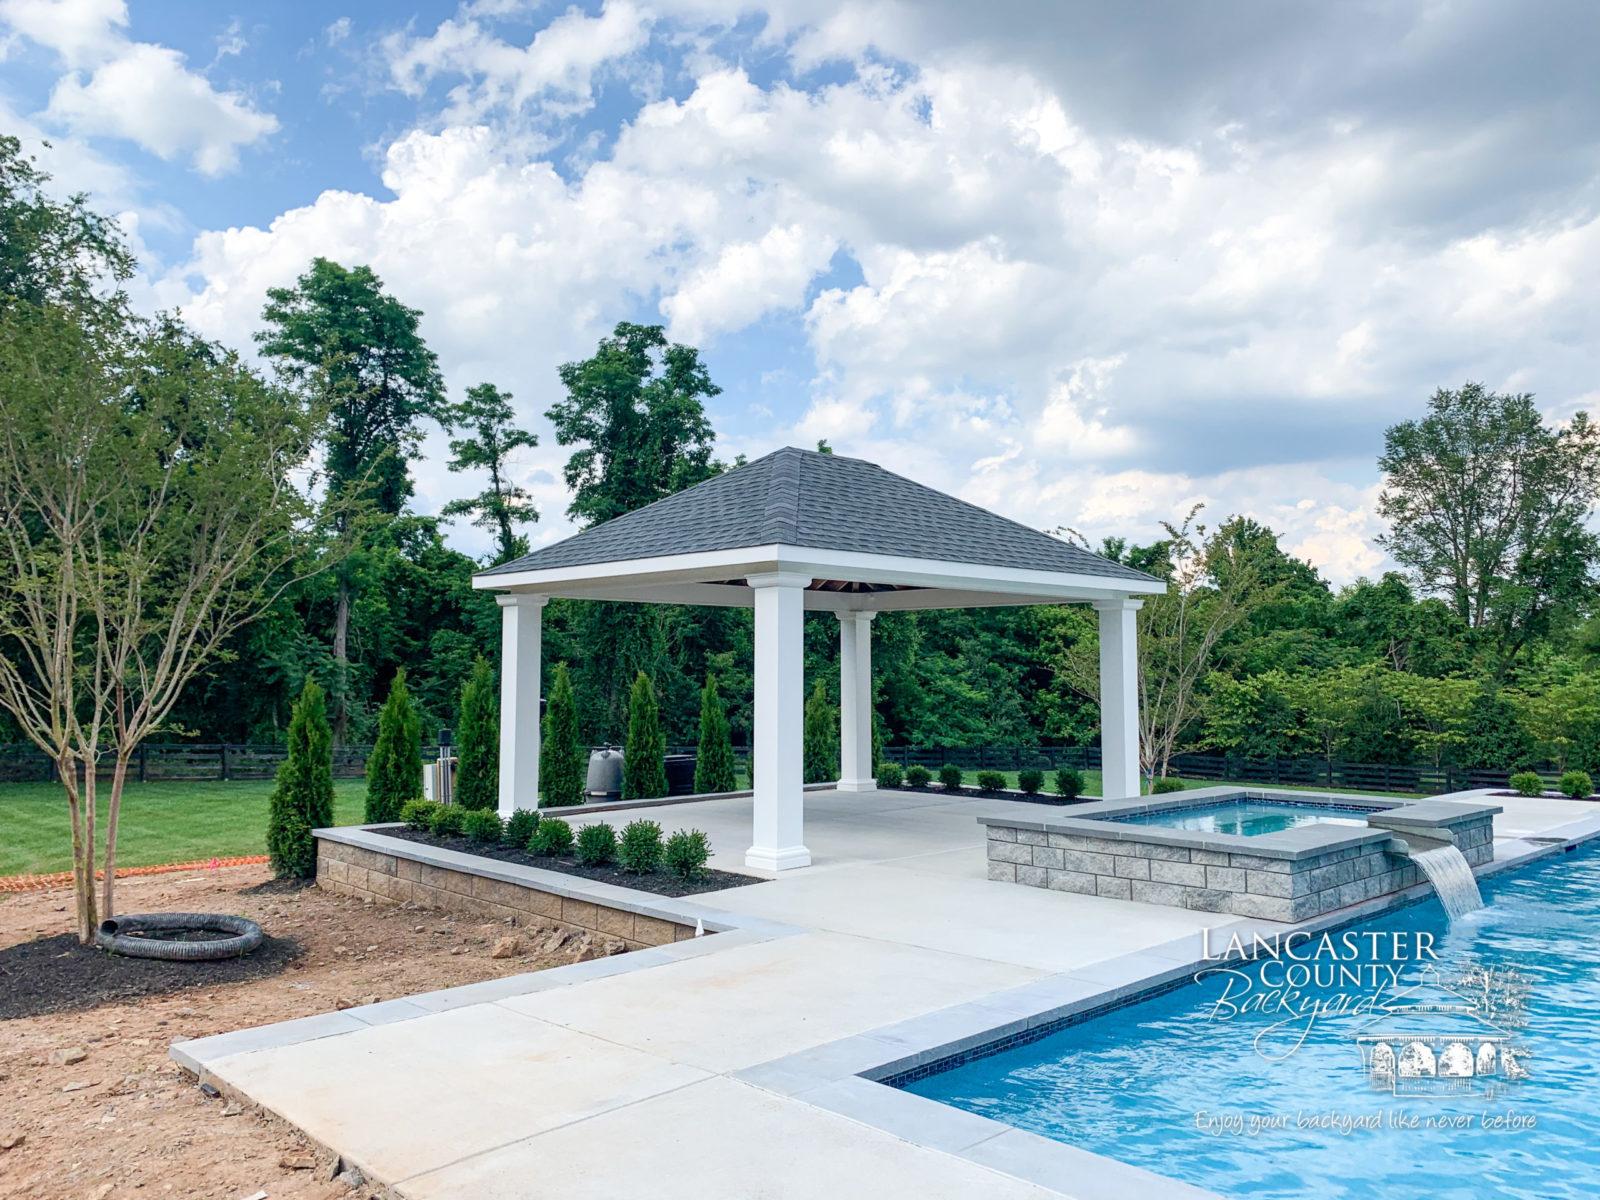 14x18 caribbean modern pavilion in lancaster pa